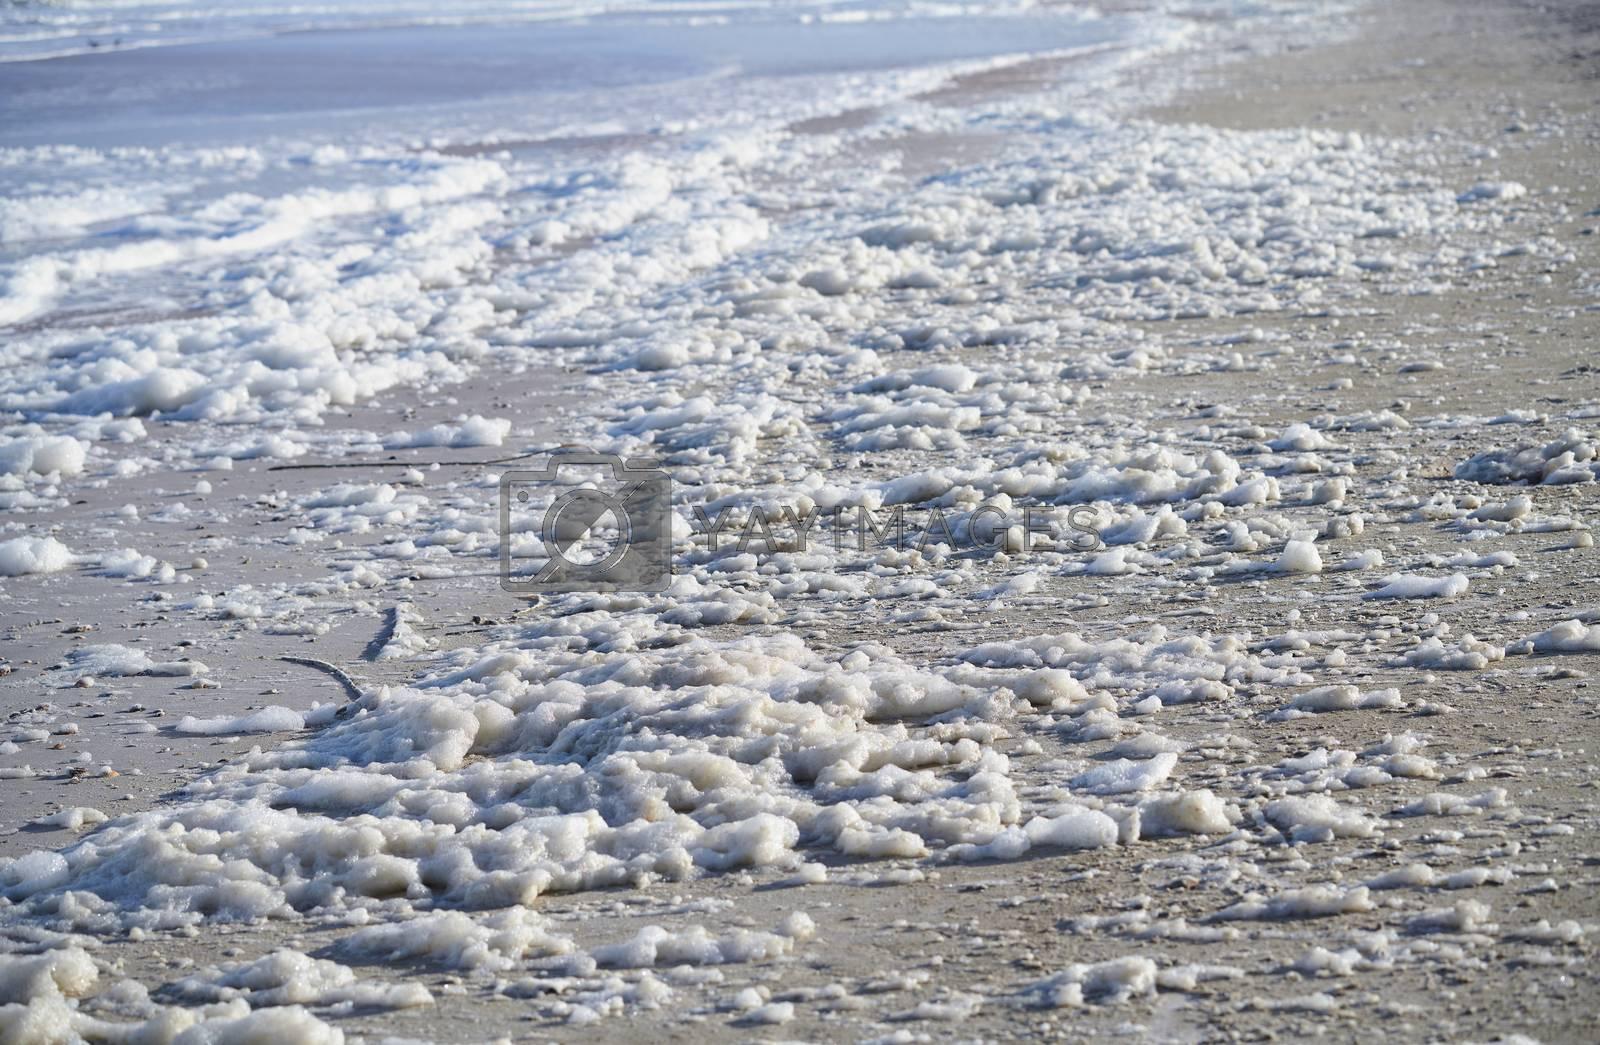 Sea foam on the coast at Pacific Ocean